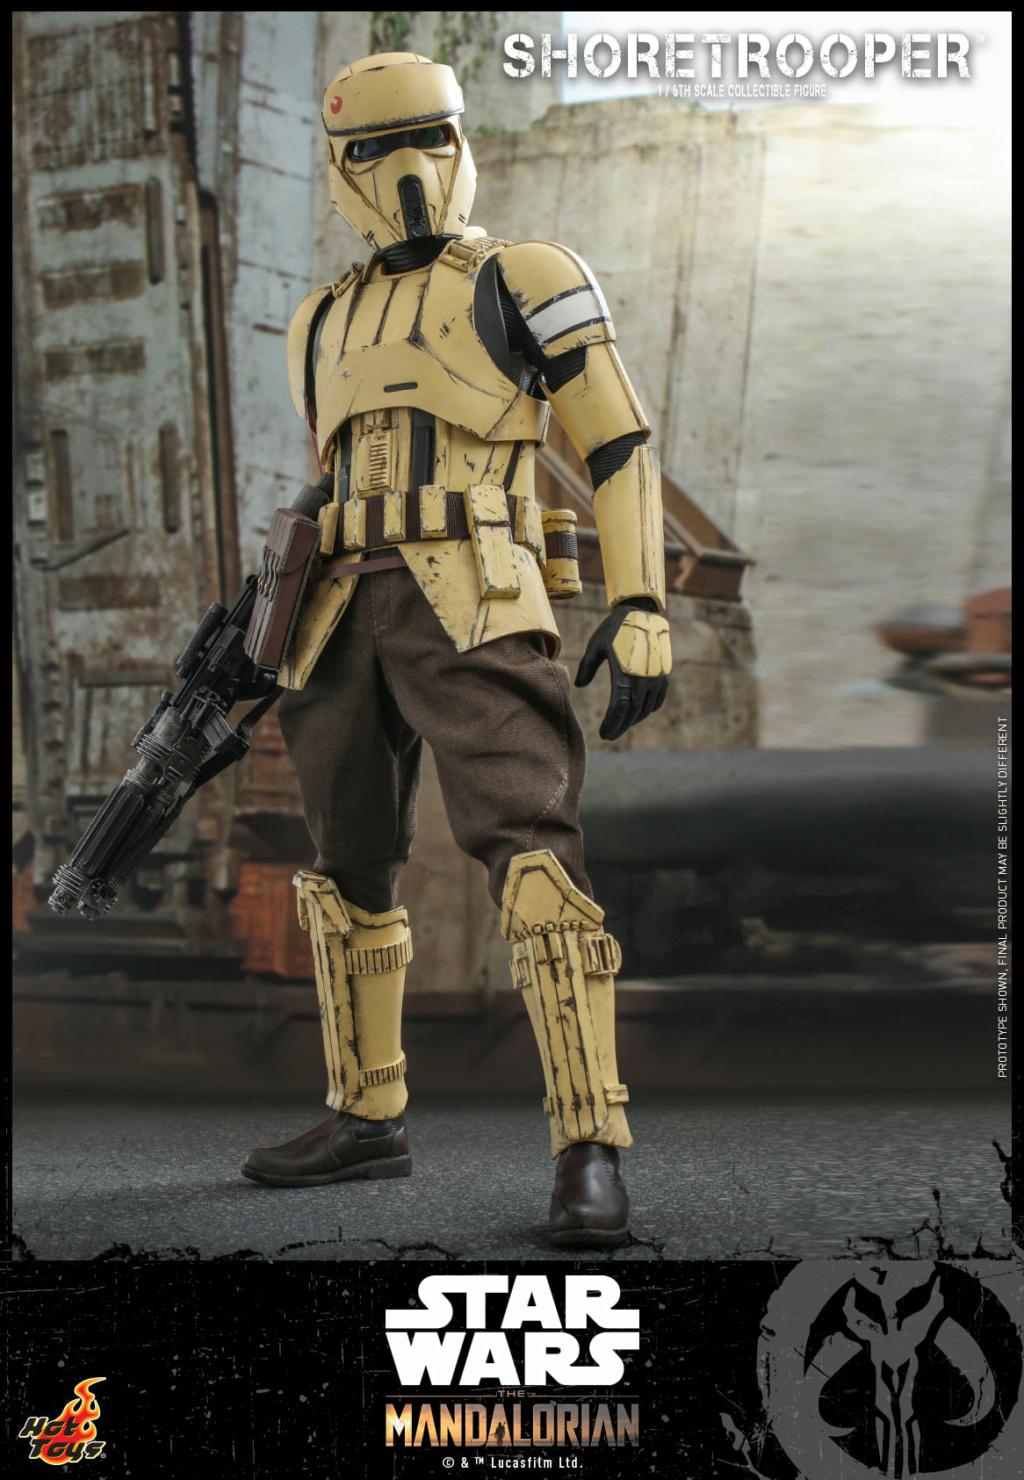 Shoretrooper 1/6 Collectible Figure The Mandalorian Hot Toys Shoret17